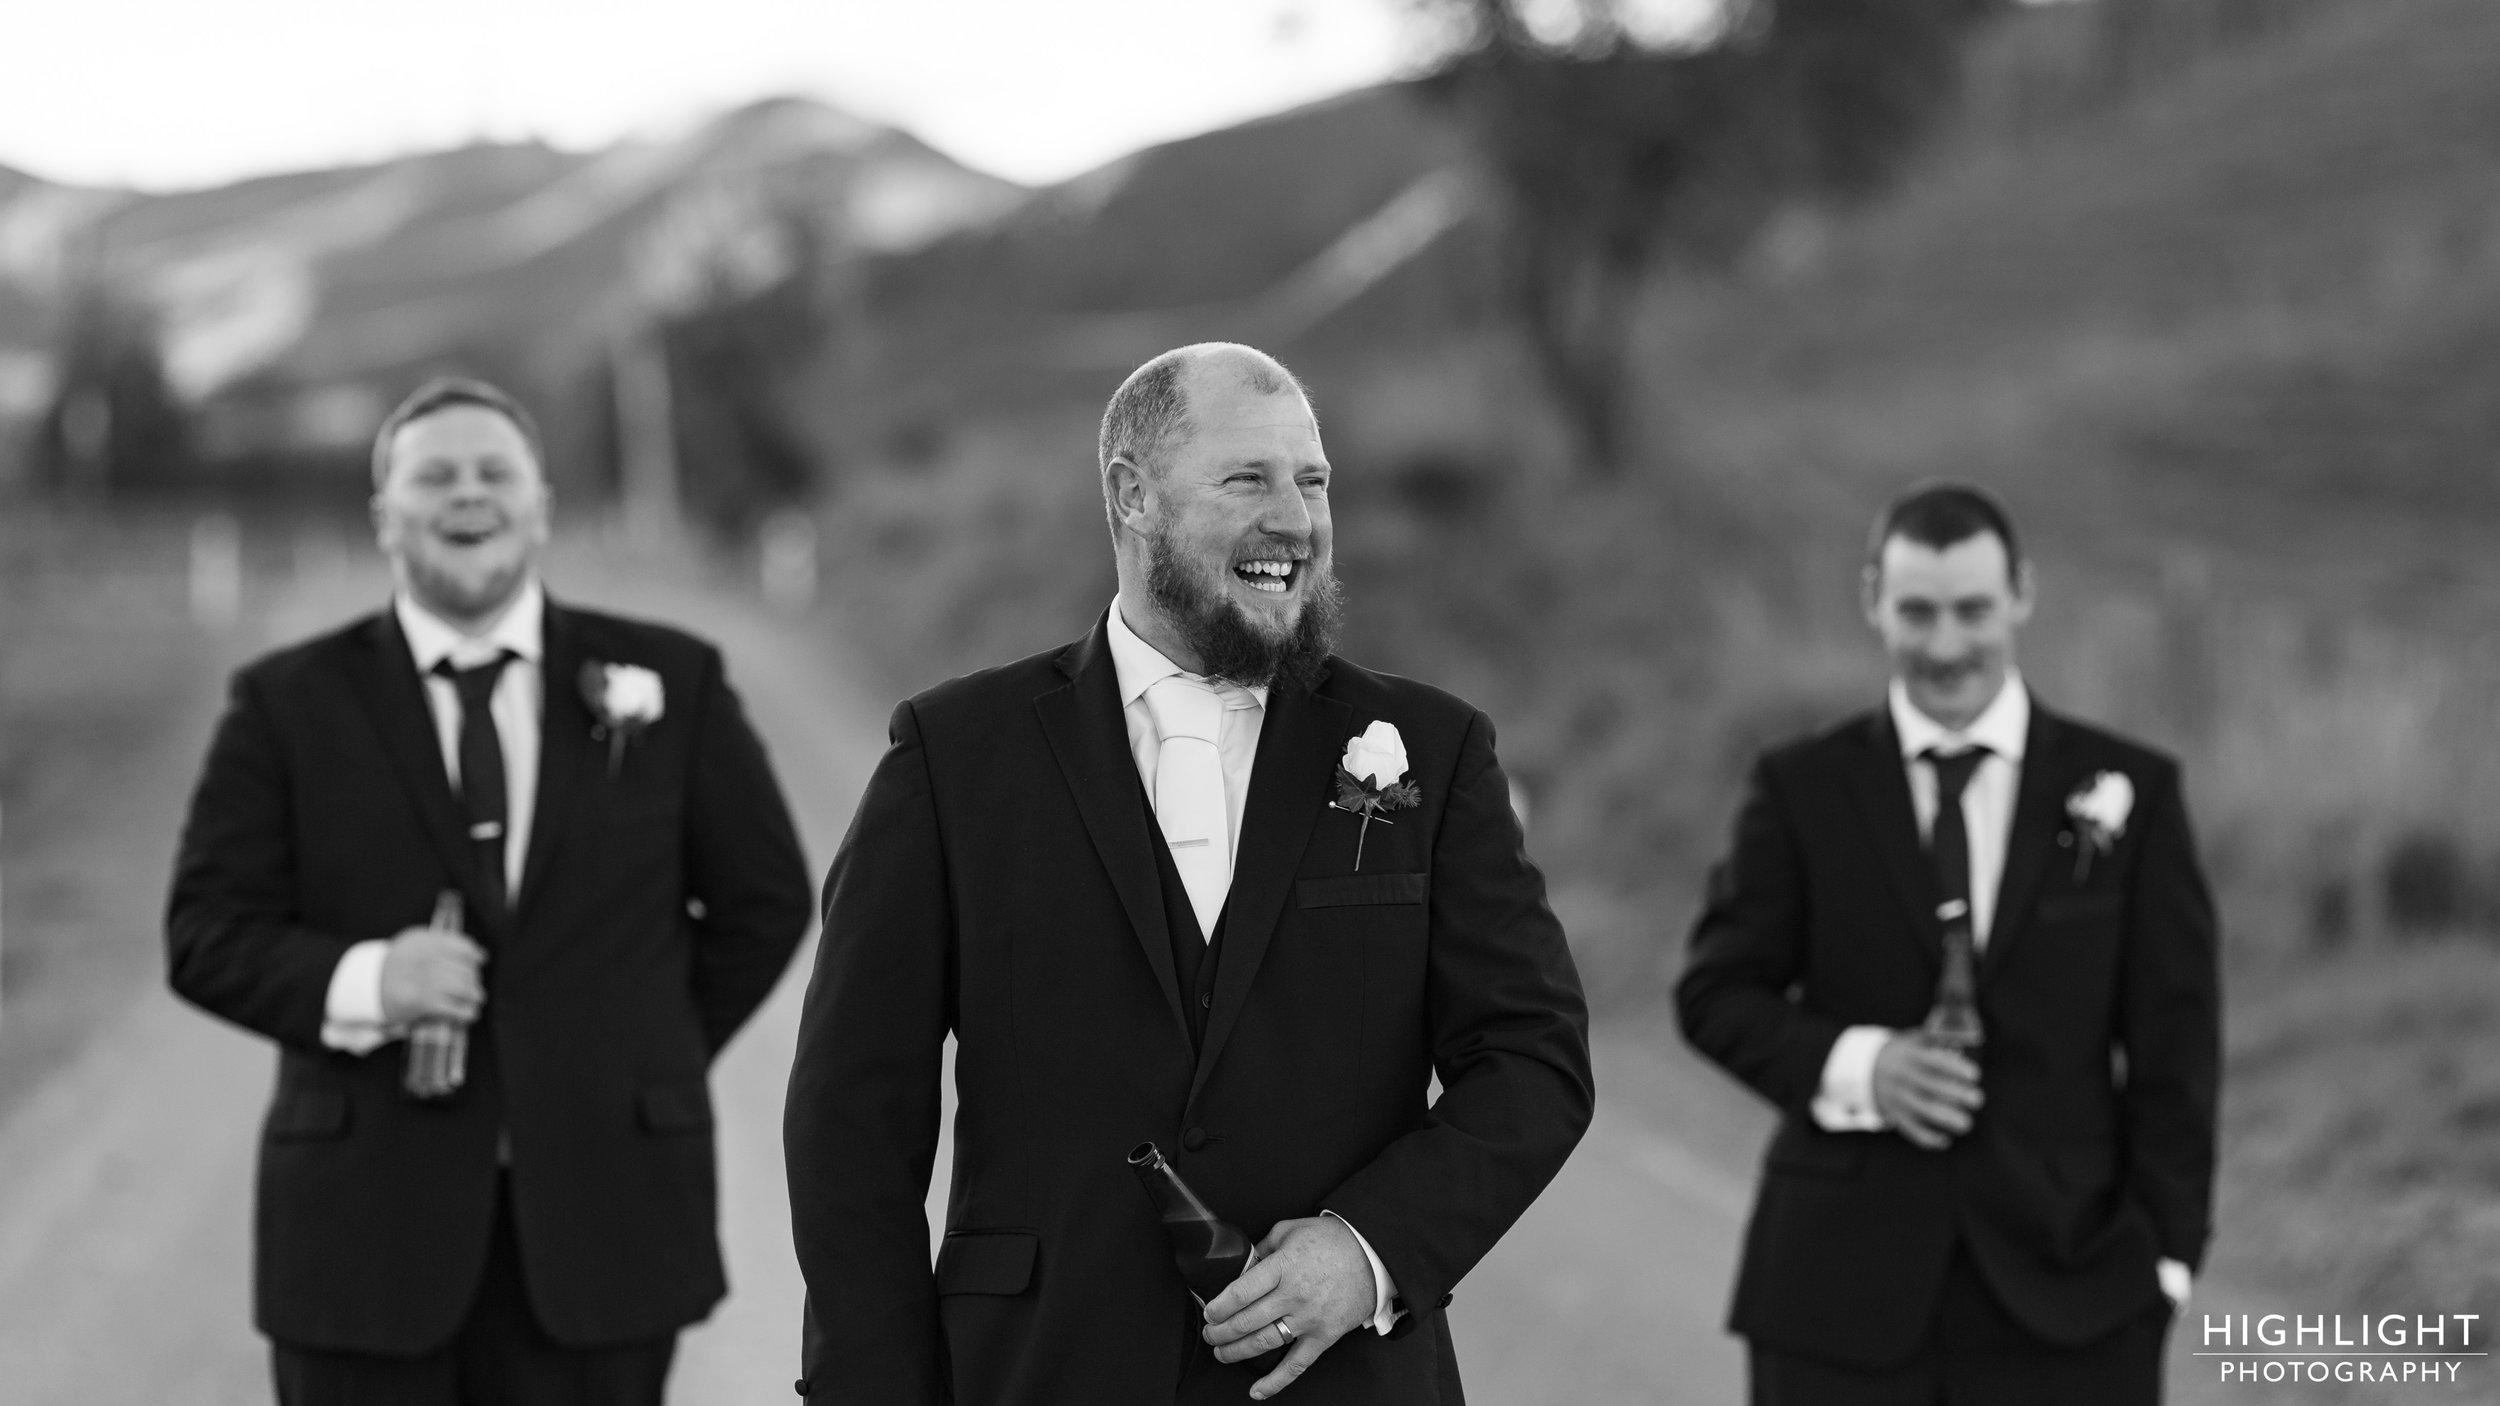 makoura-wedding-photography-highlight-new-zealand-58.jpg